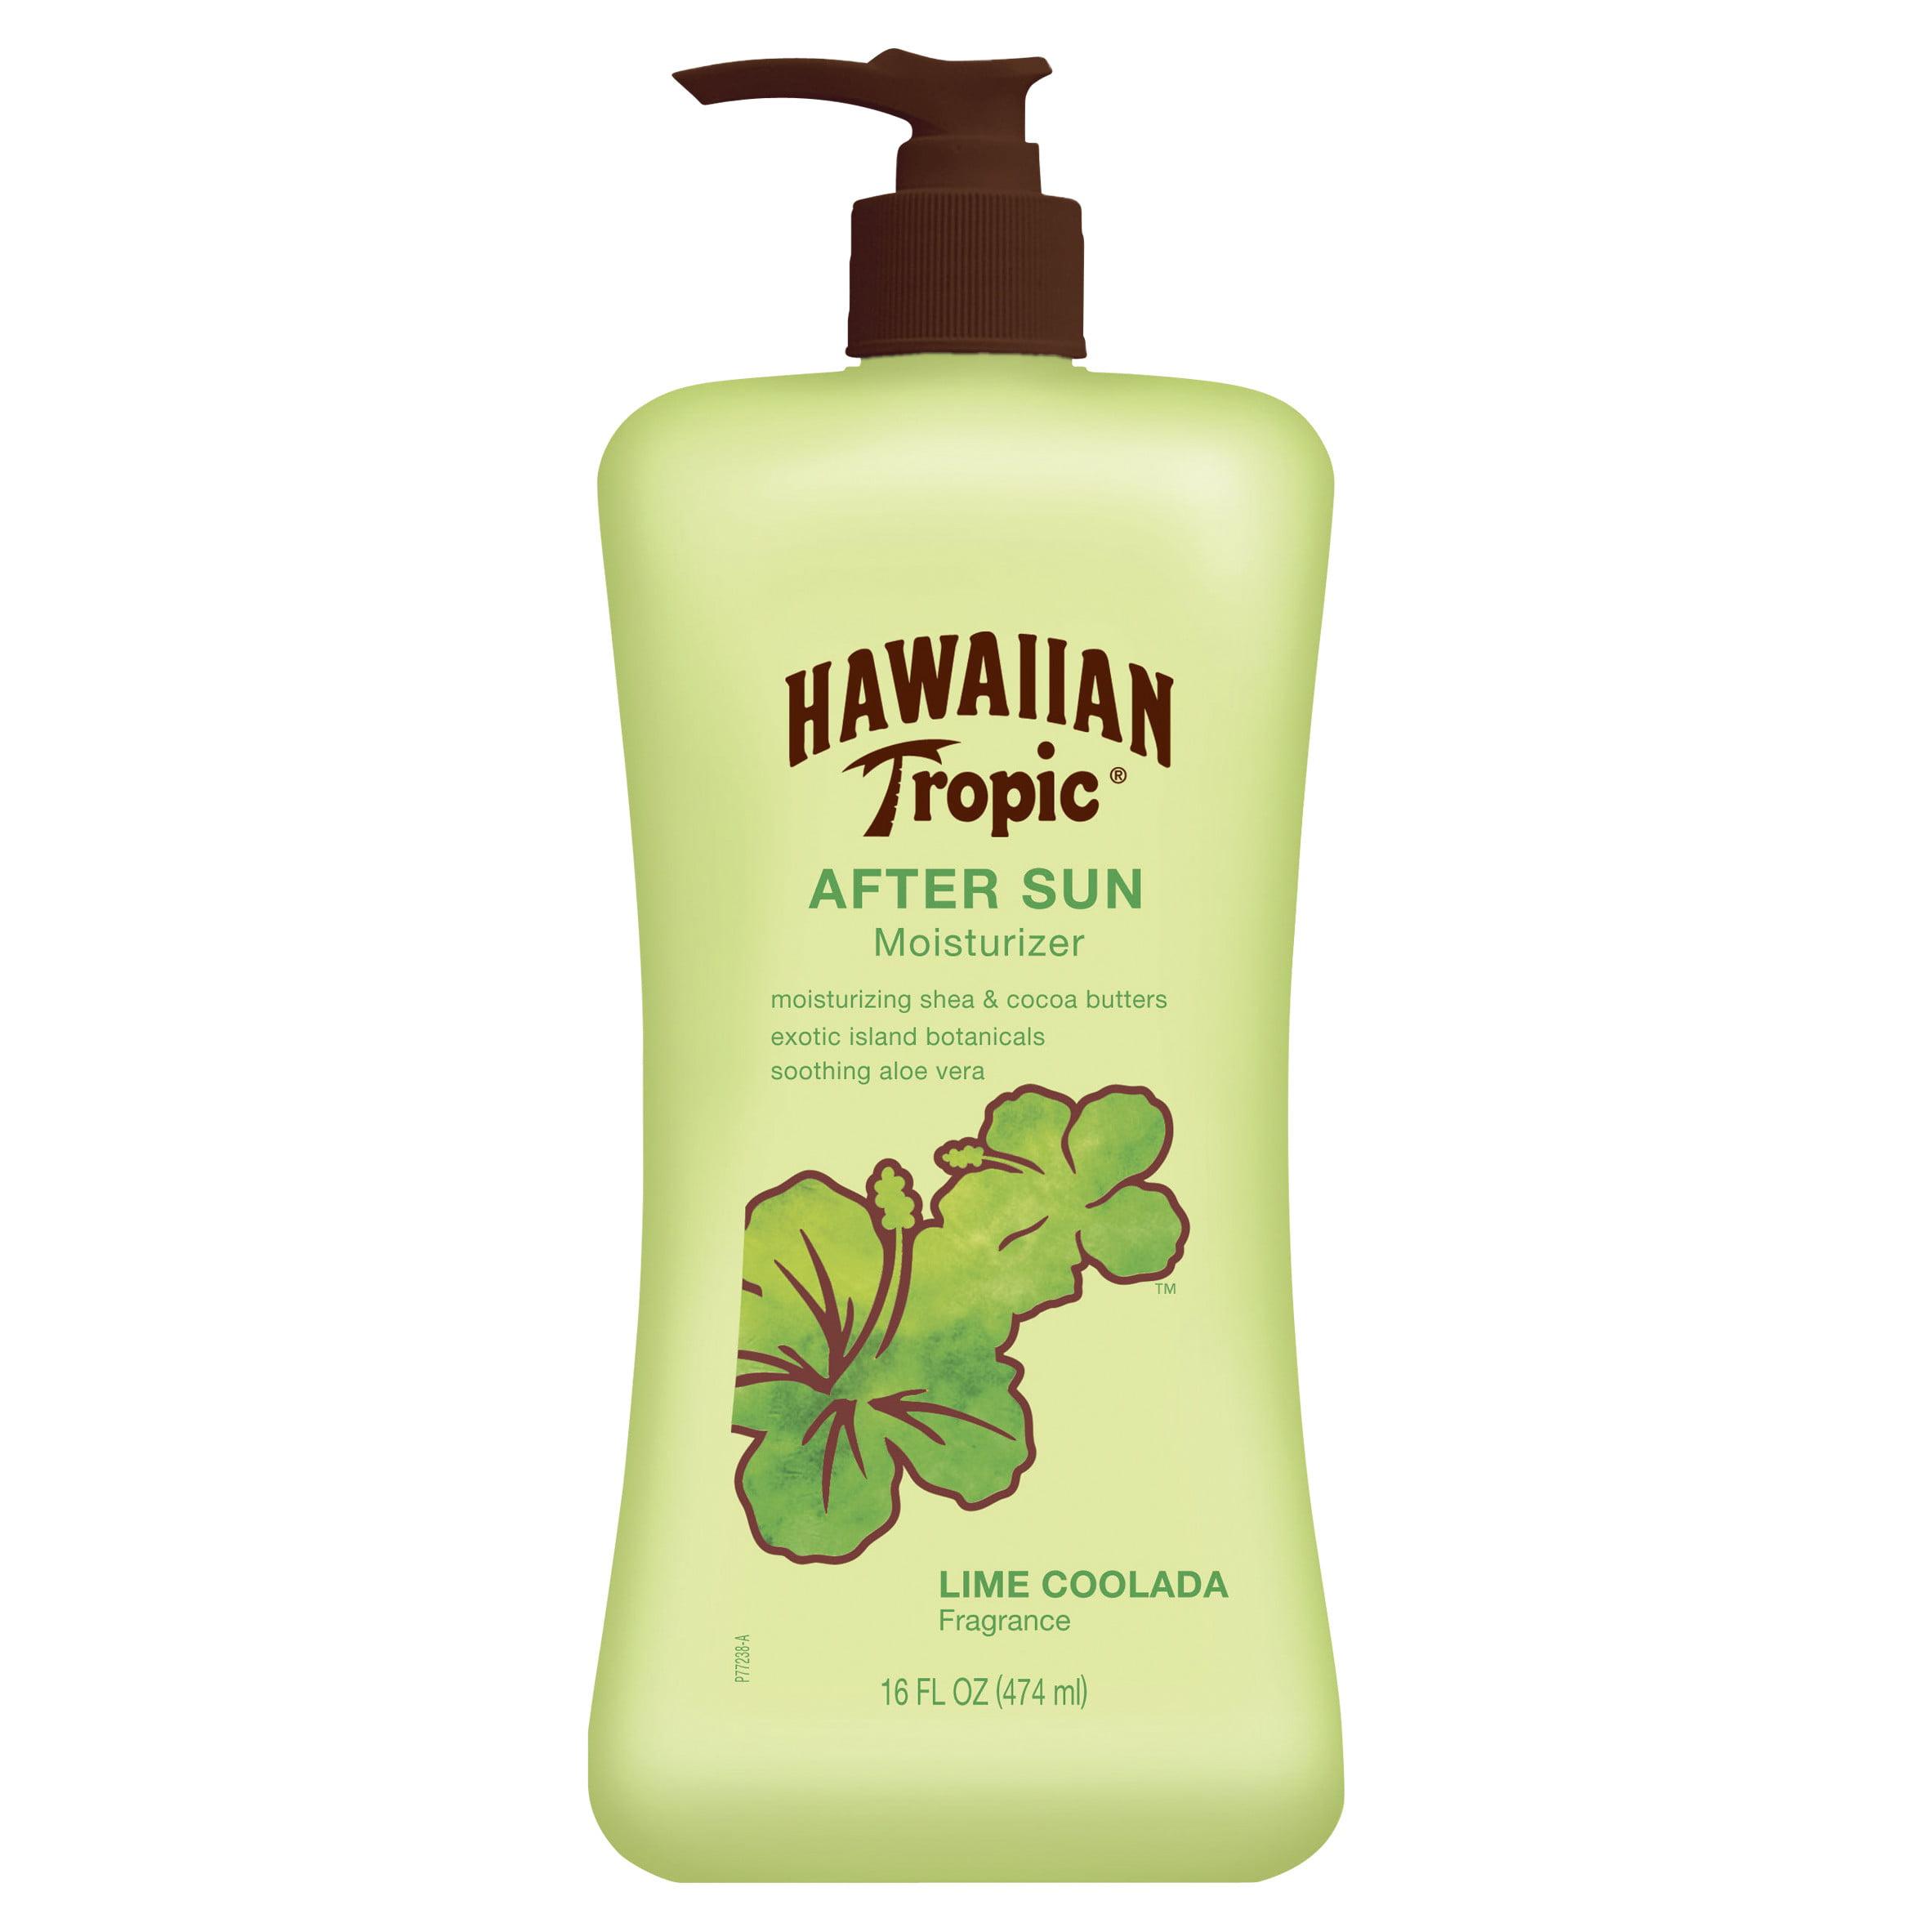 Lime Coolada After Sun Moisturizer Green by Hawaiian Tropic #10